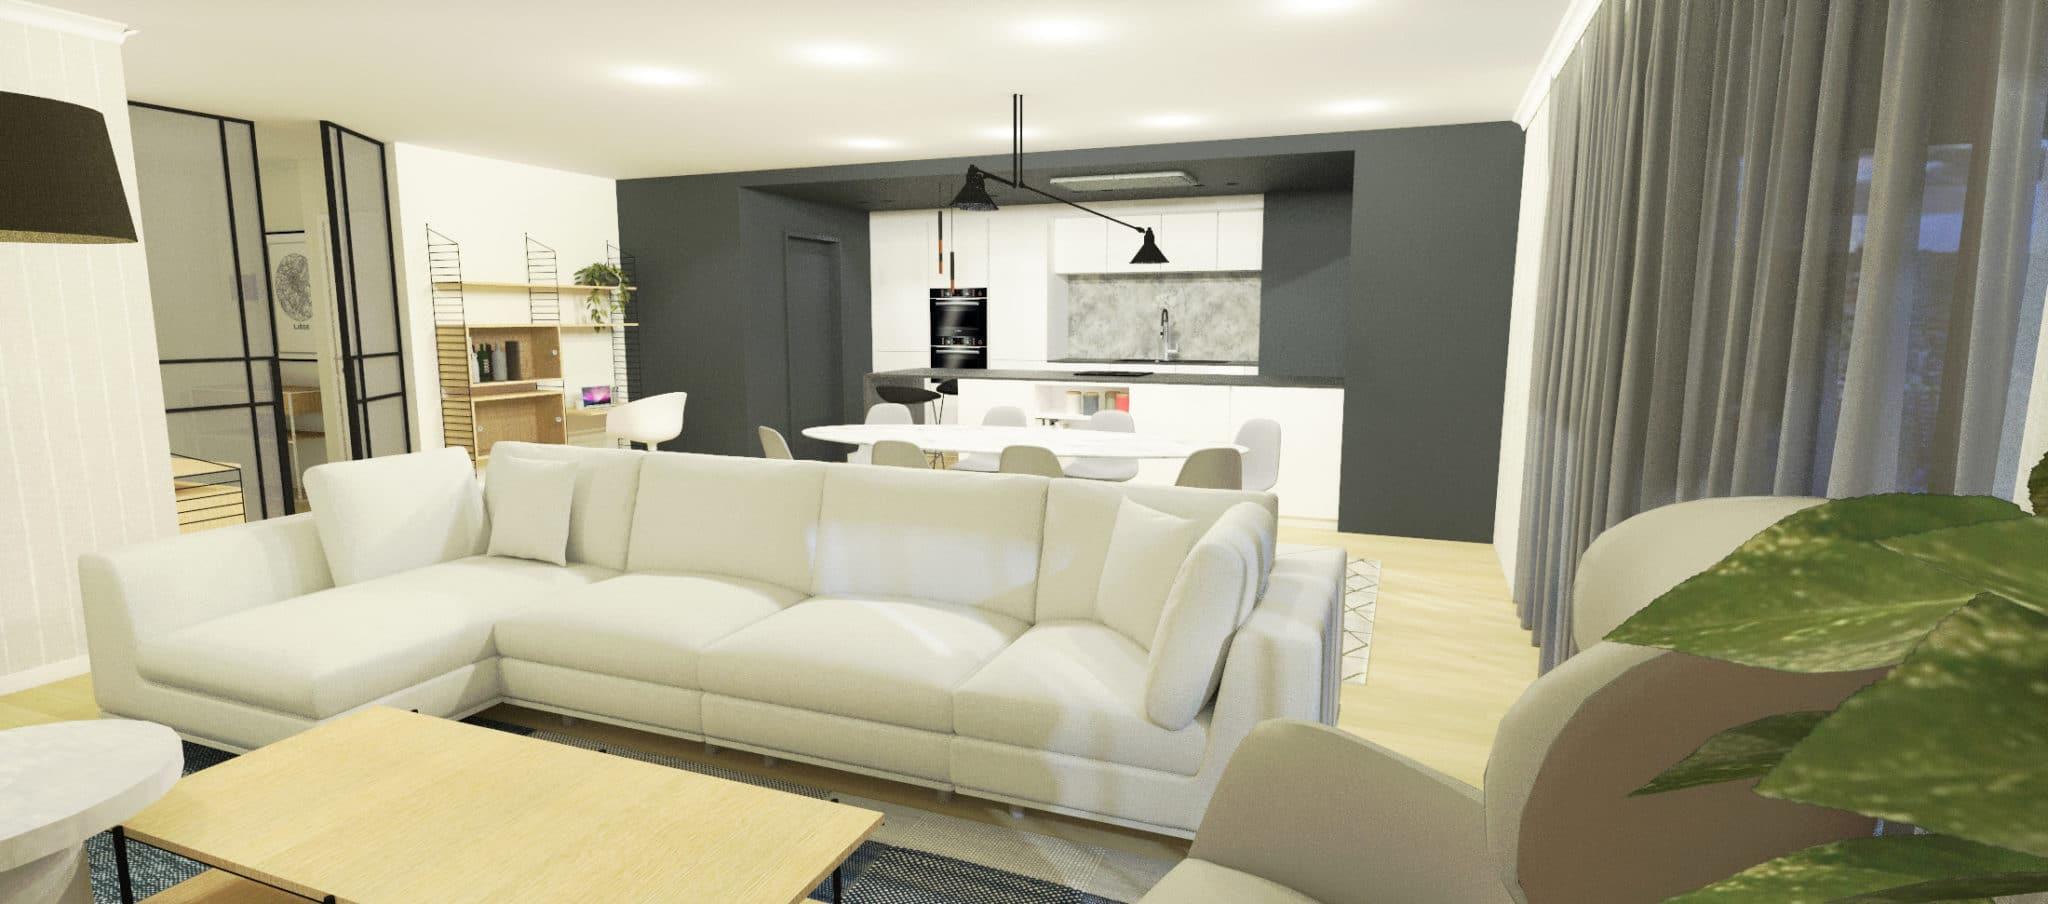 Projet Rogier - Rendu salon